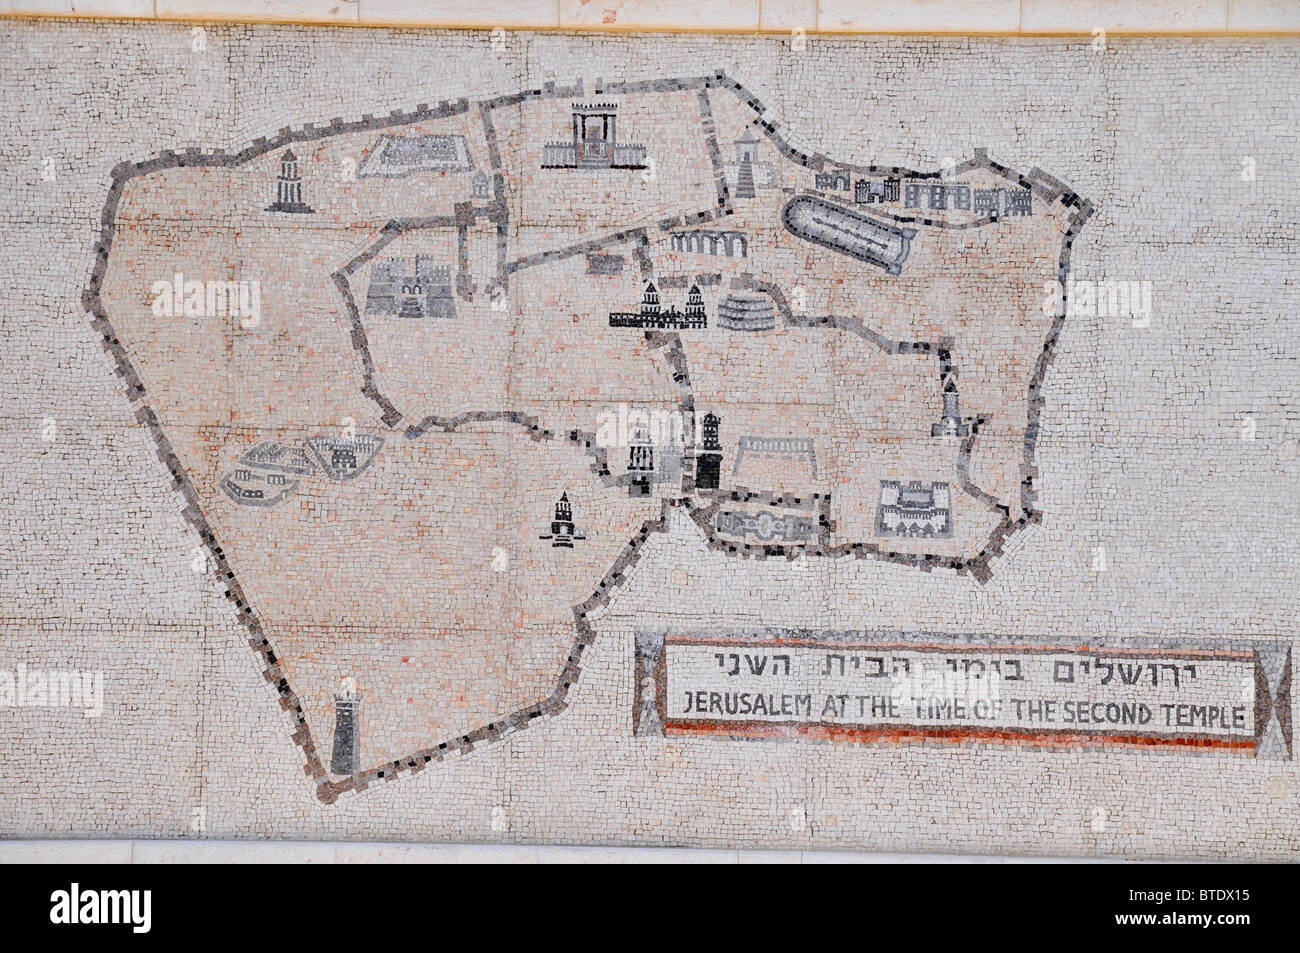 Israel Jerusalem Israel Museum Map of the Model of Jerusalem in